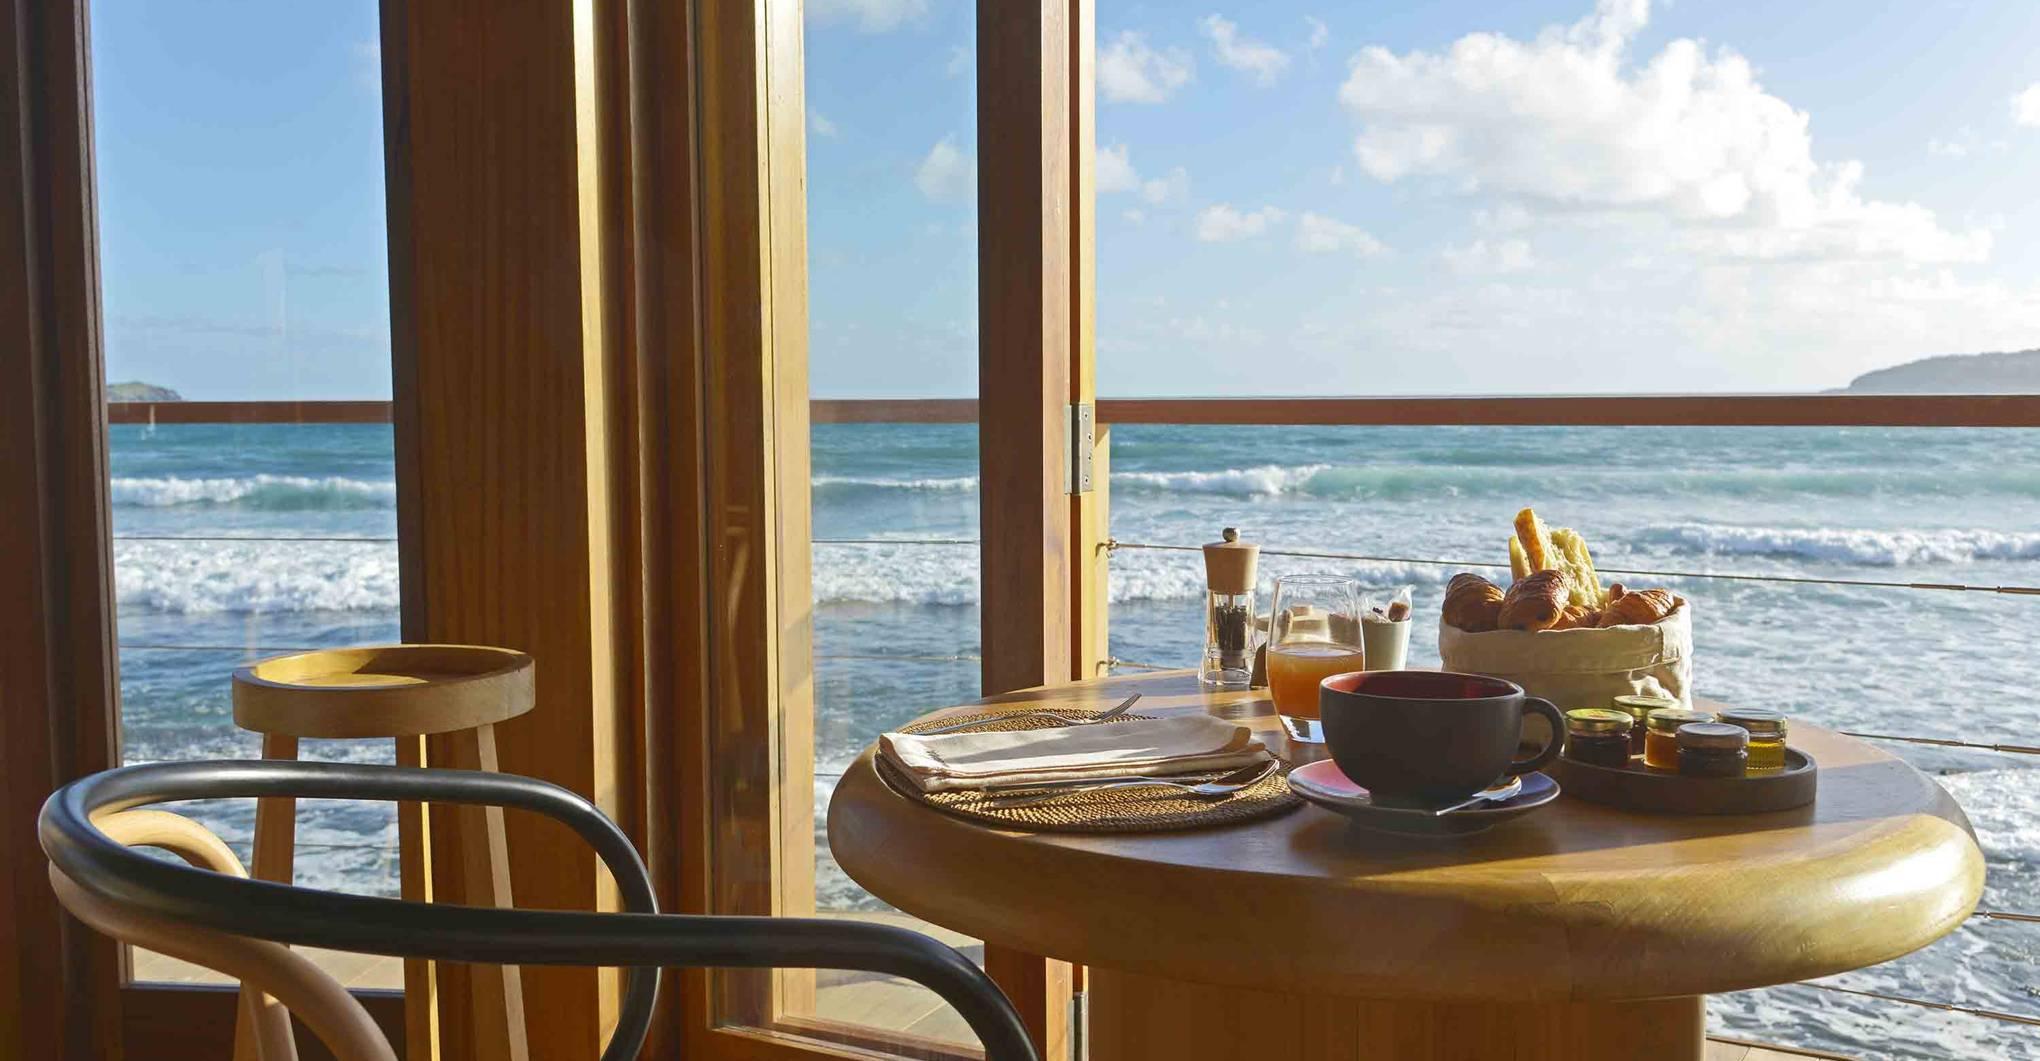 Hotel Manapany, St Barth's review